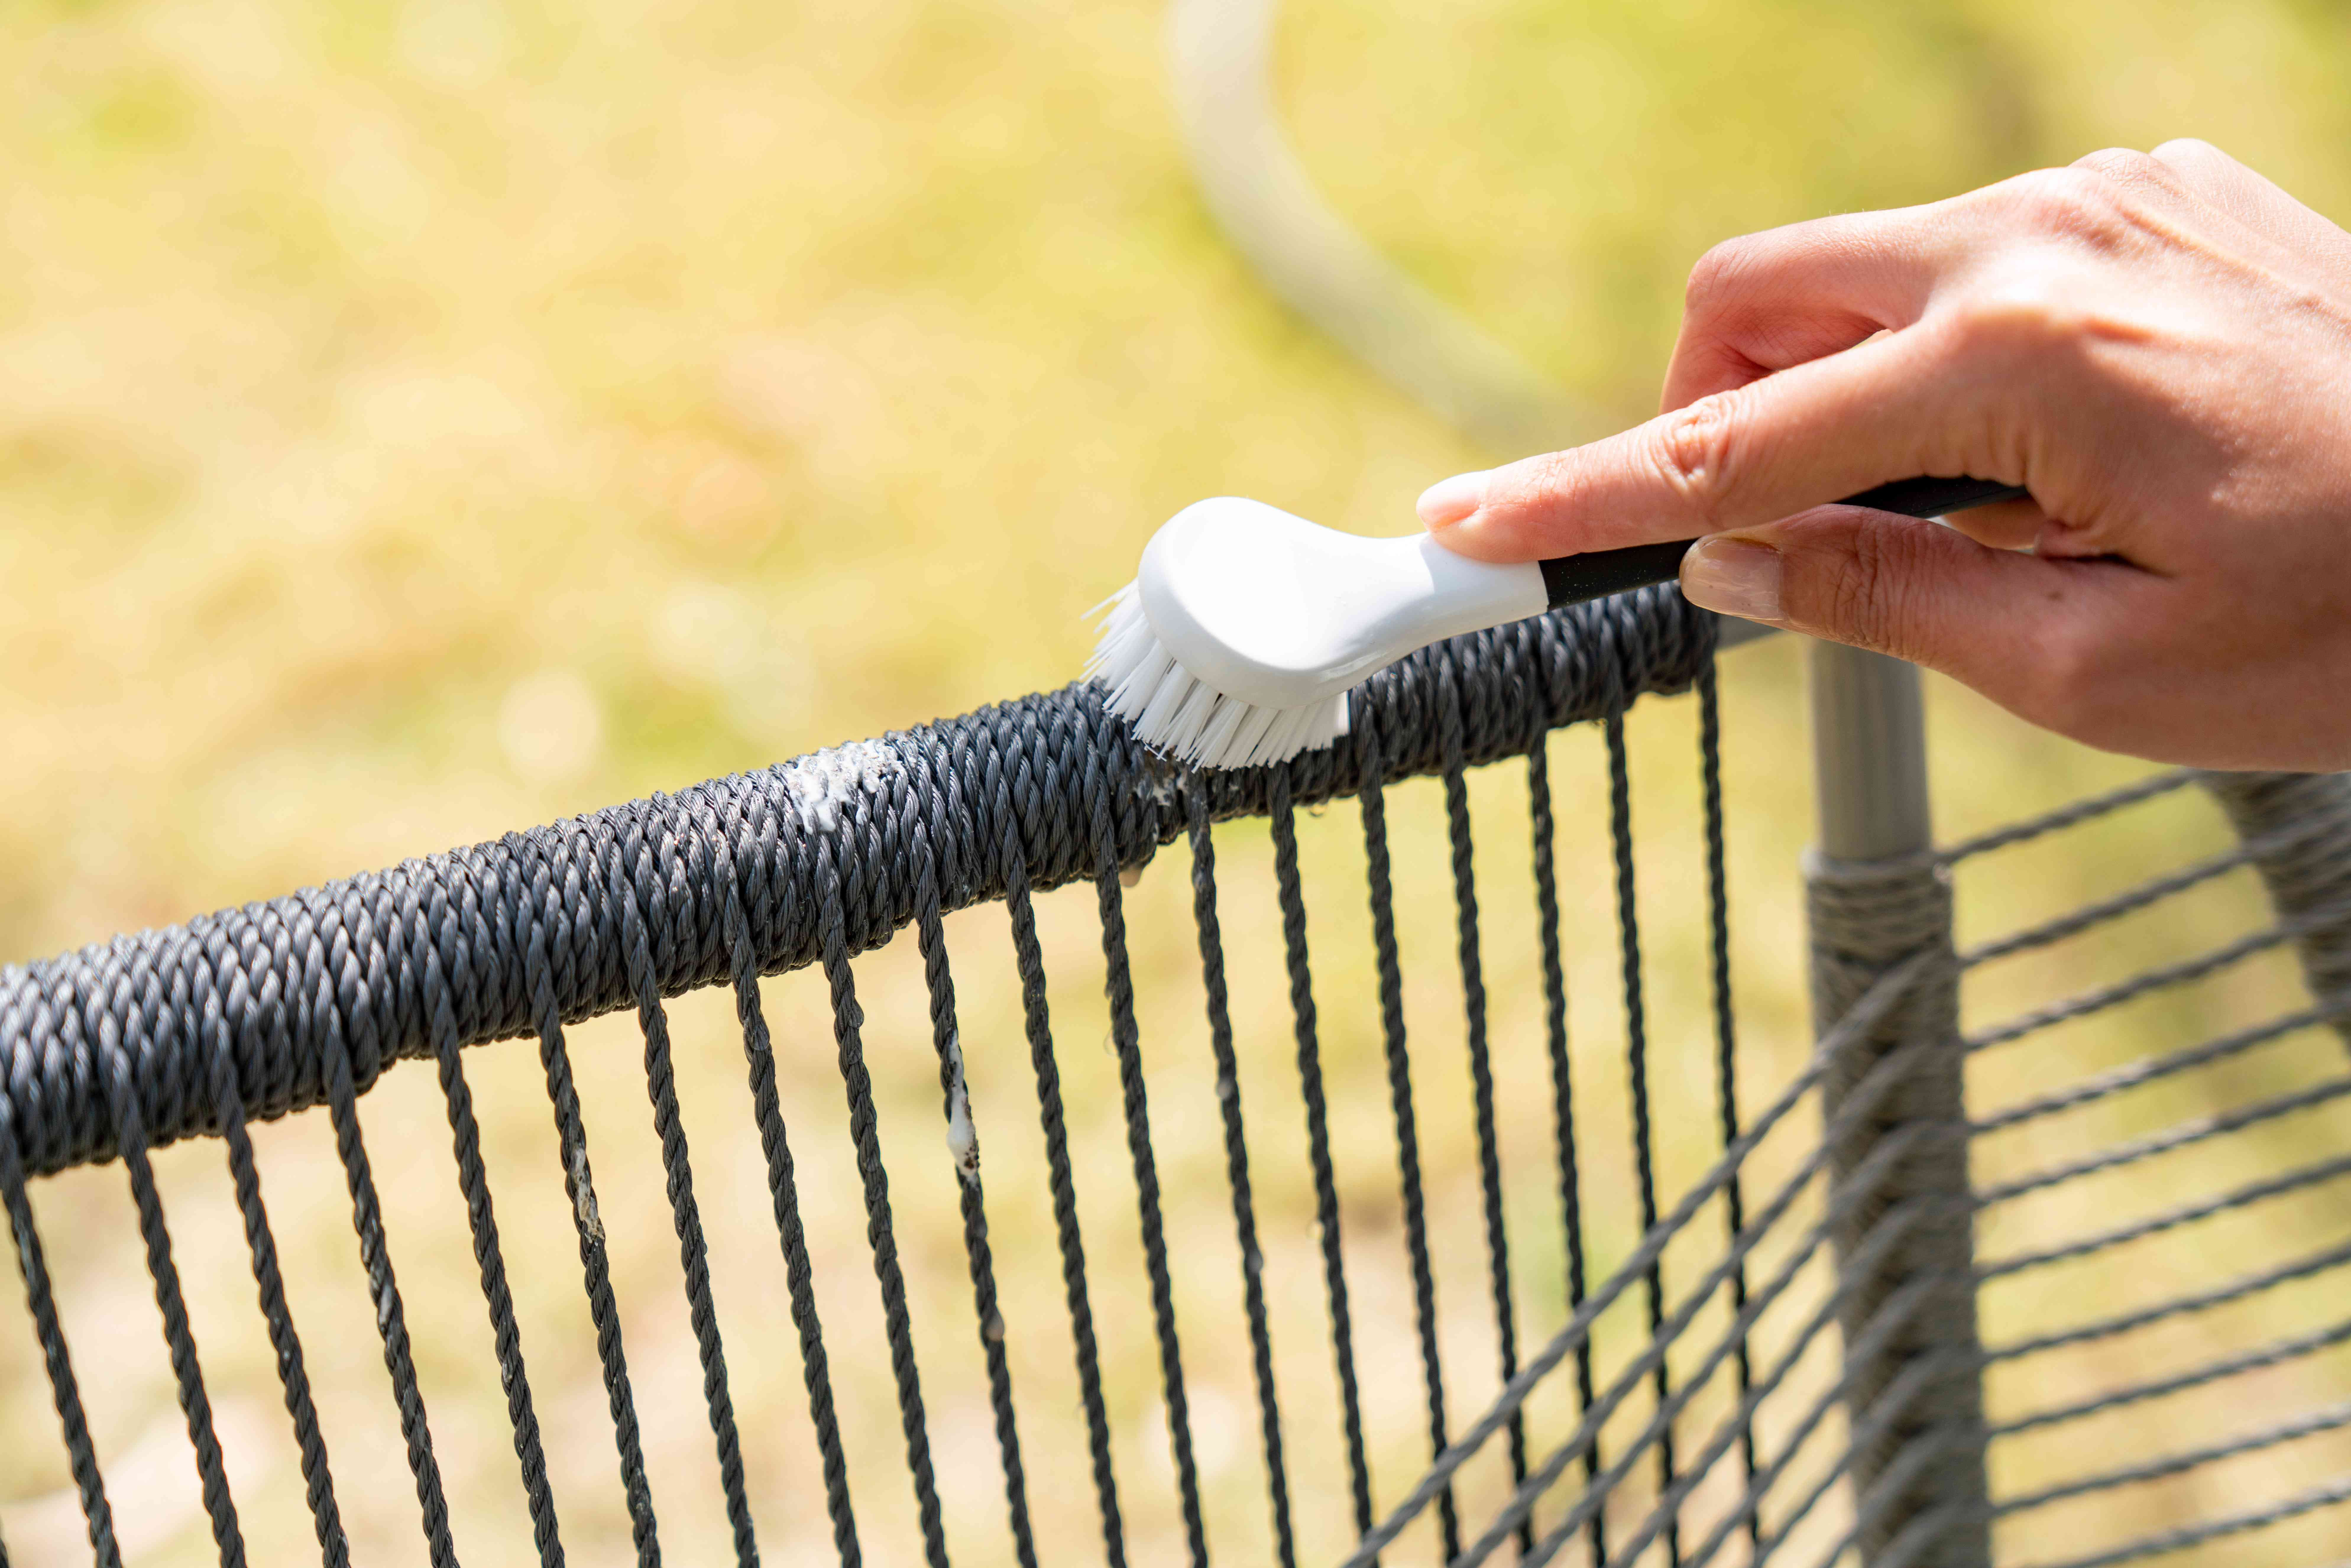 Soft-bristled brush scrubbing away bird poop on outdoor fabric